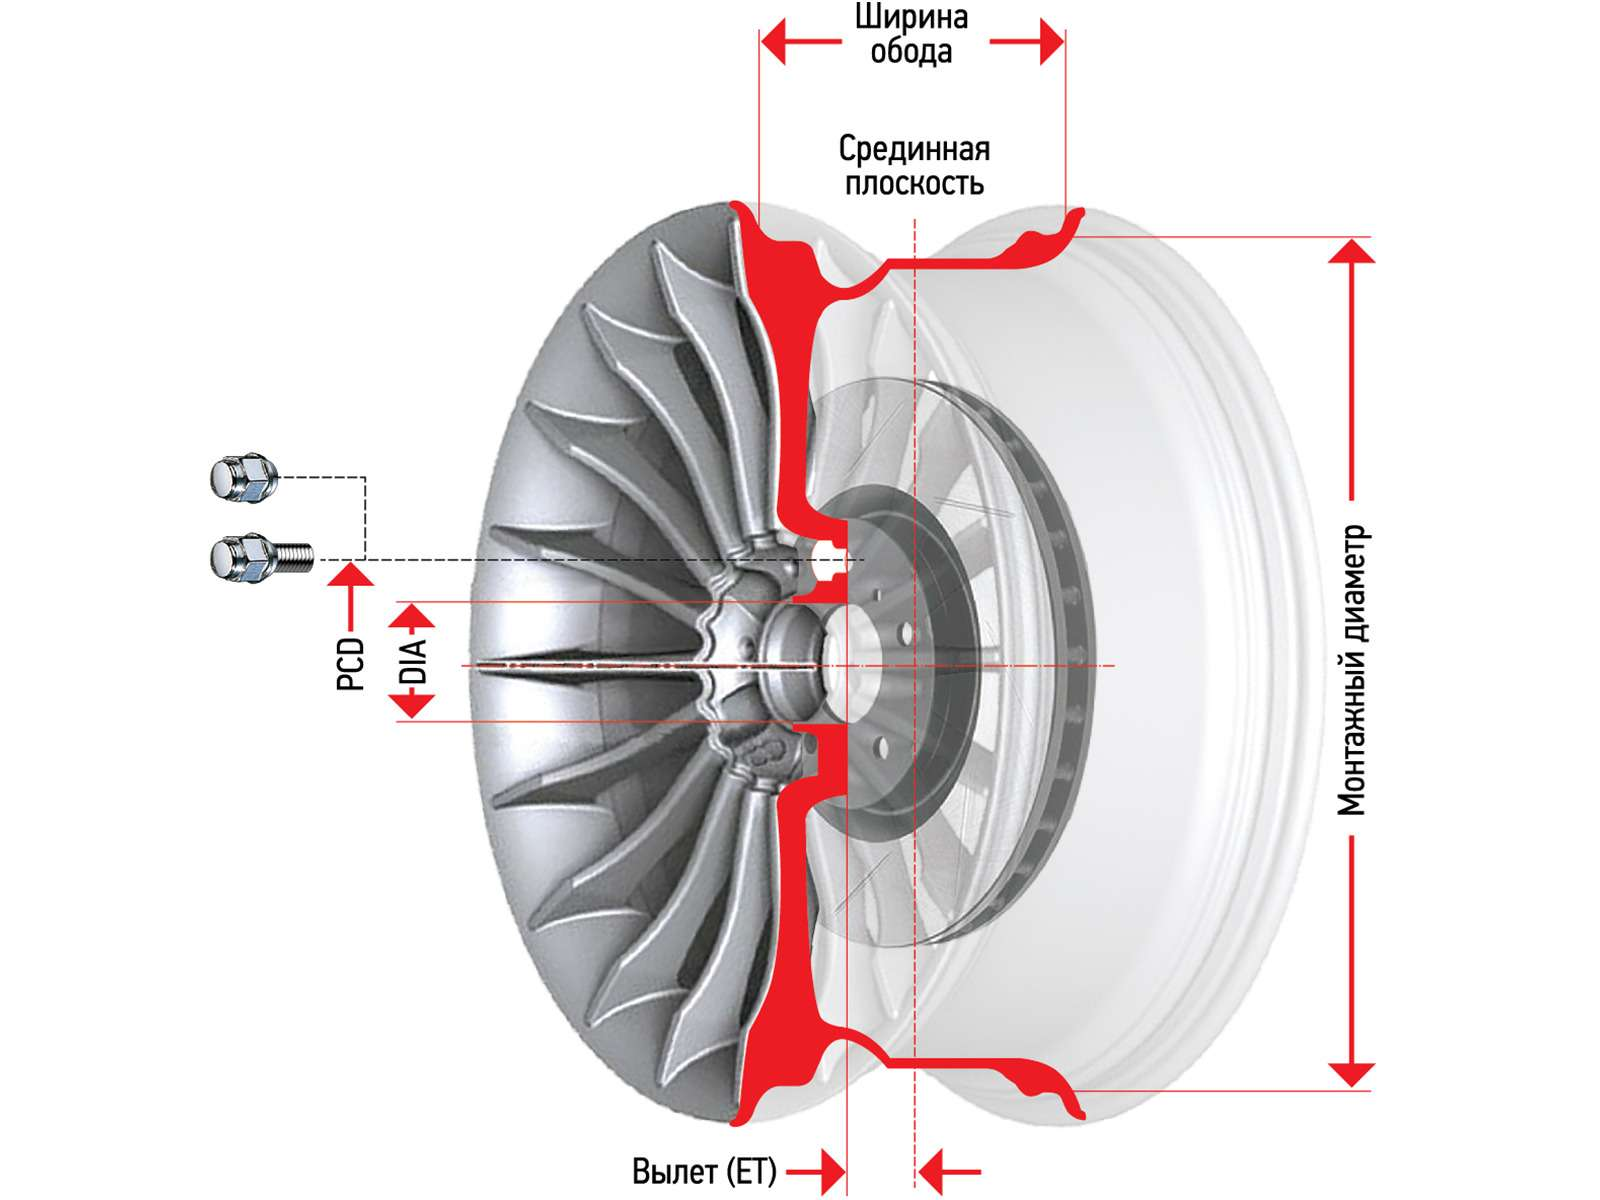 ширина обода диска